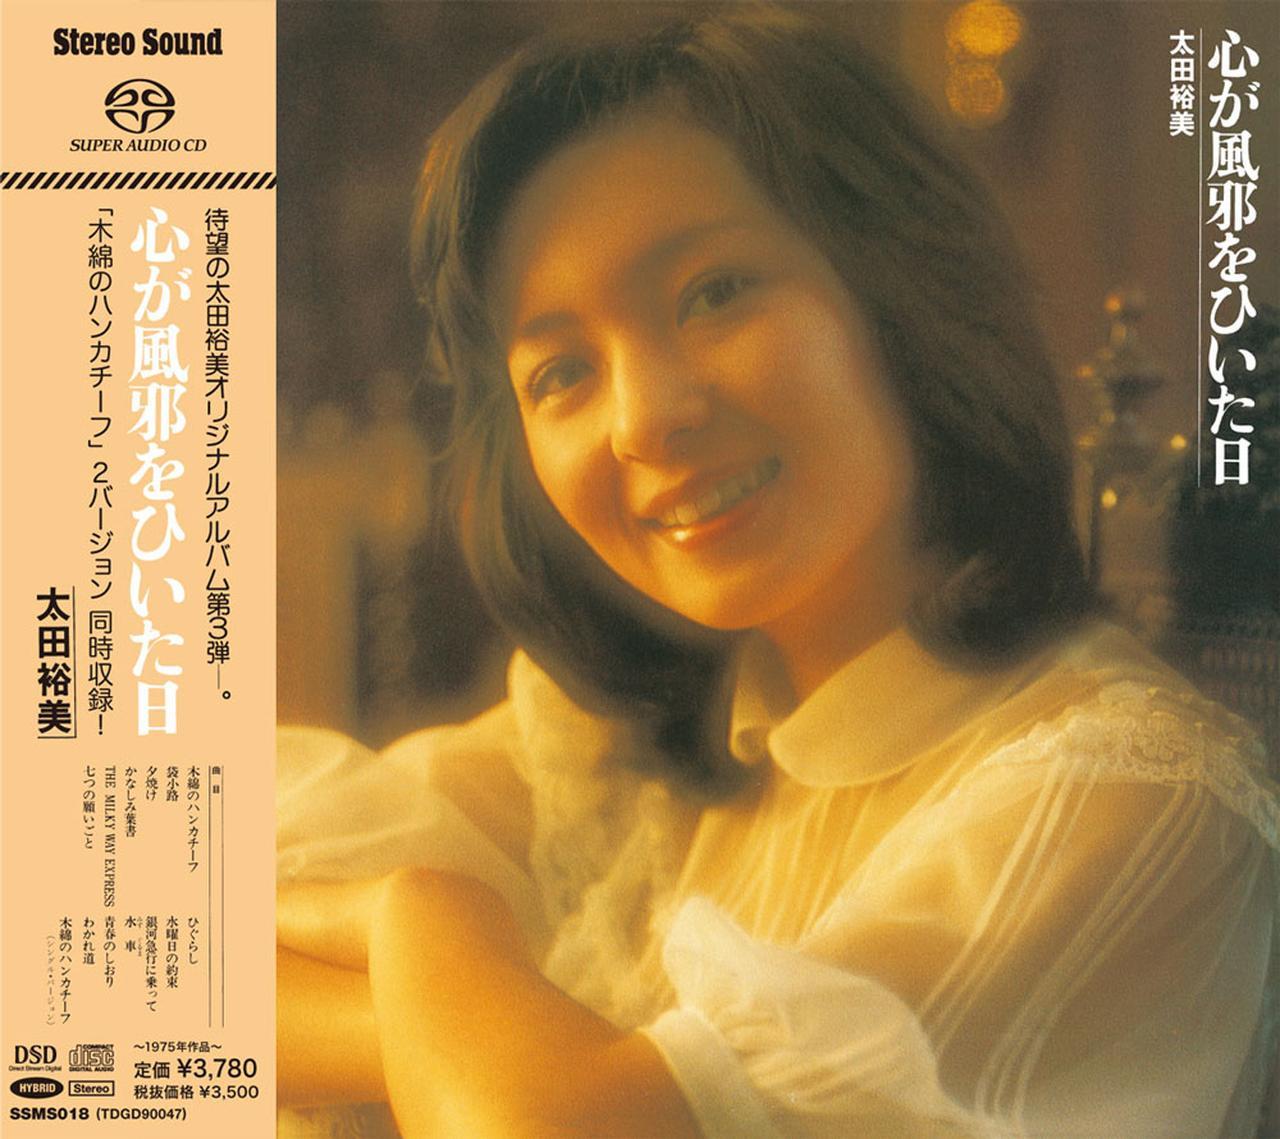 Images : 太田裕美「心が風邪をひいた日」(SACD) SSMS-018